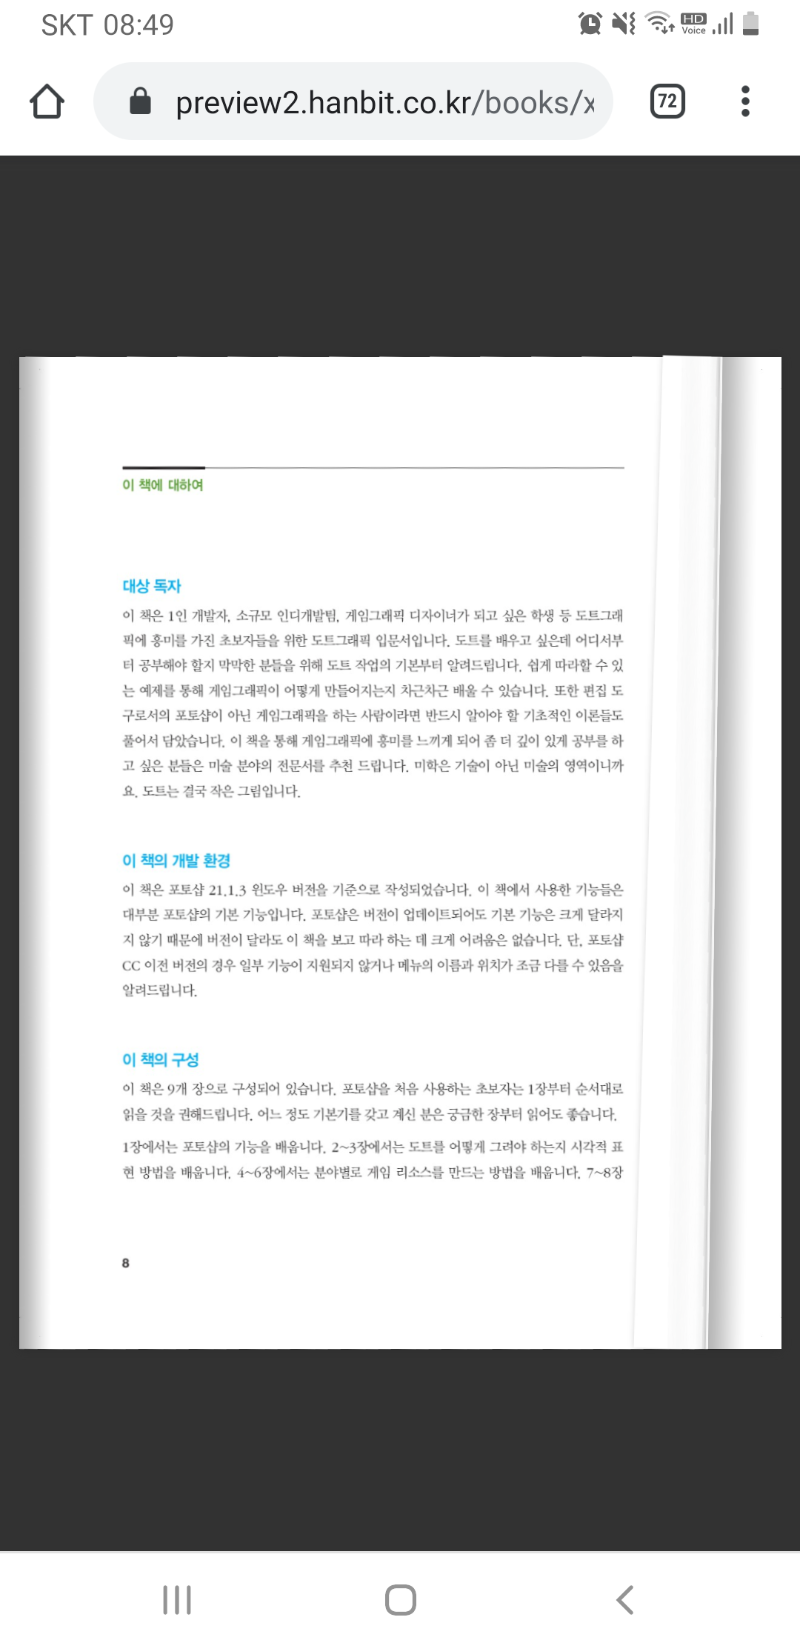 Screenshot_20201122-084908_Chrome.png